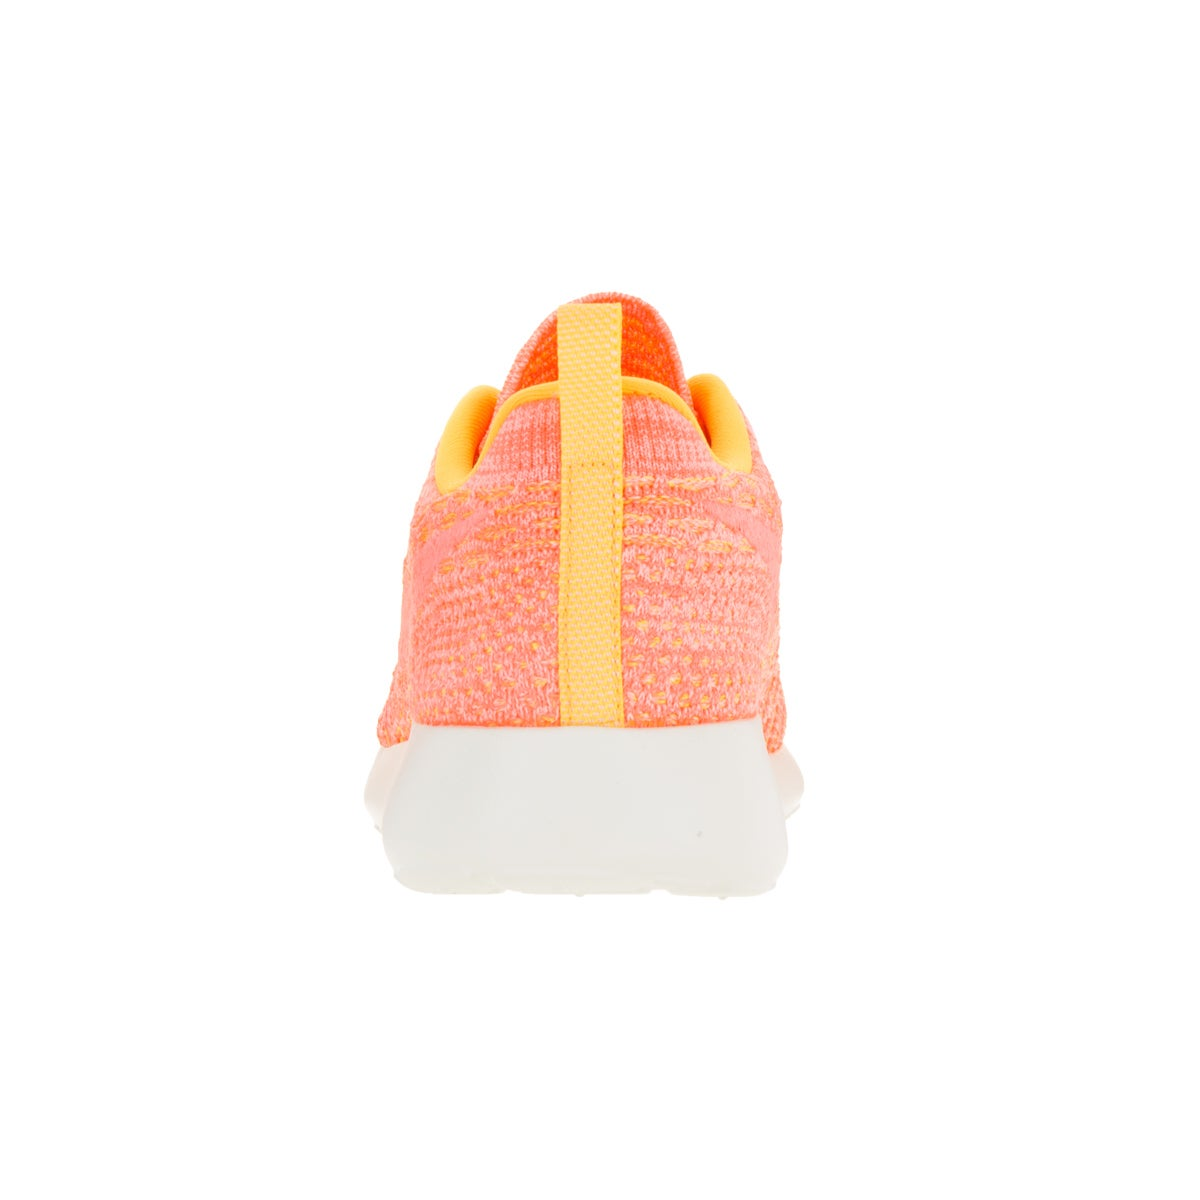 1d493ddf6855 Shop Nike Women s Roshe One Flyknit Laser Orange